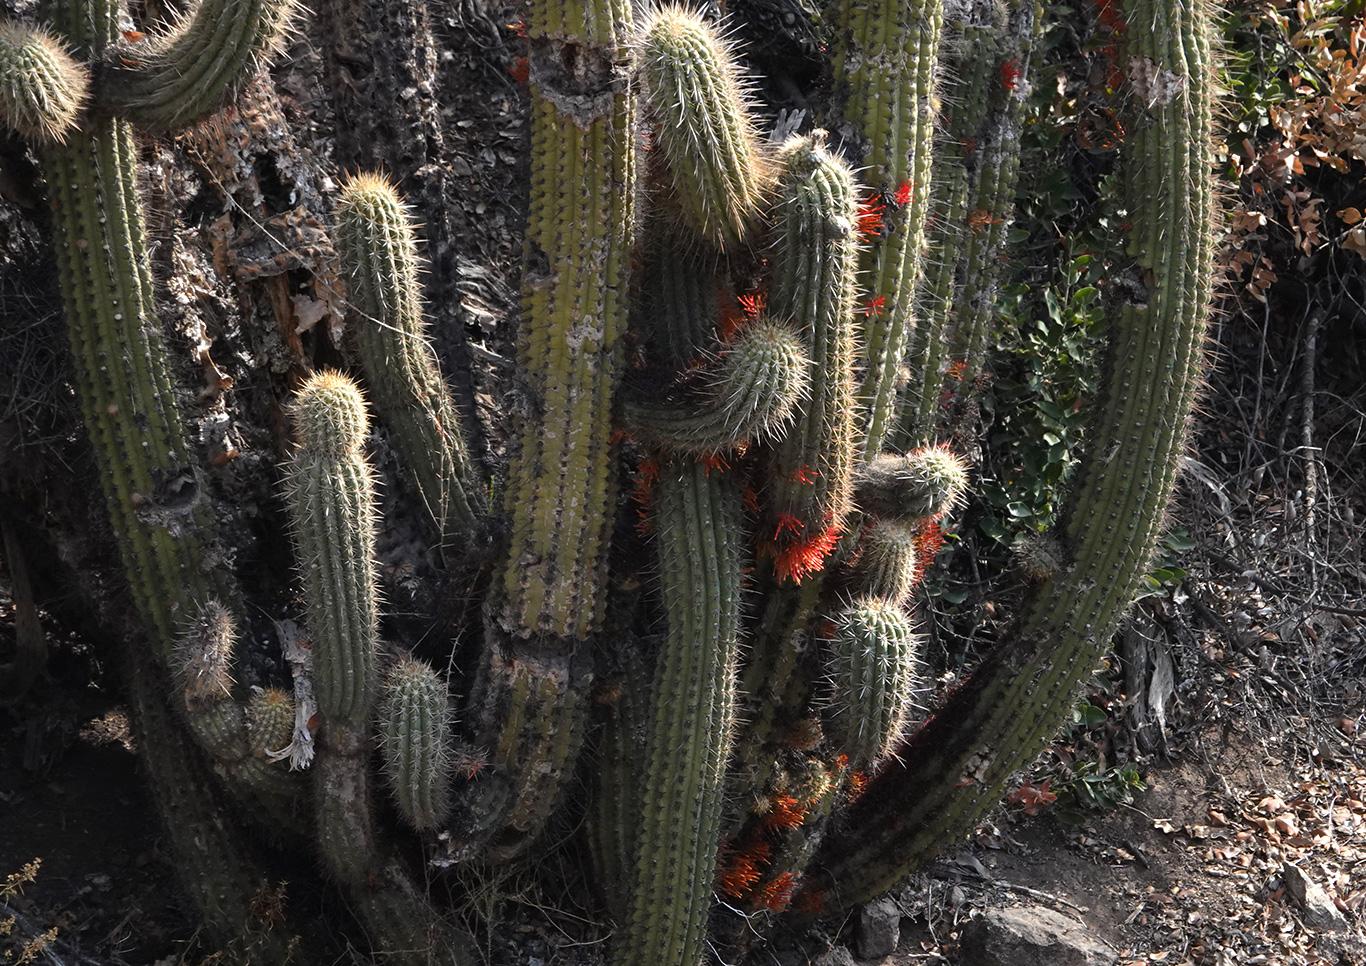 Flowering Cactus, Camino a Valle Nevado, Chile.